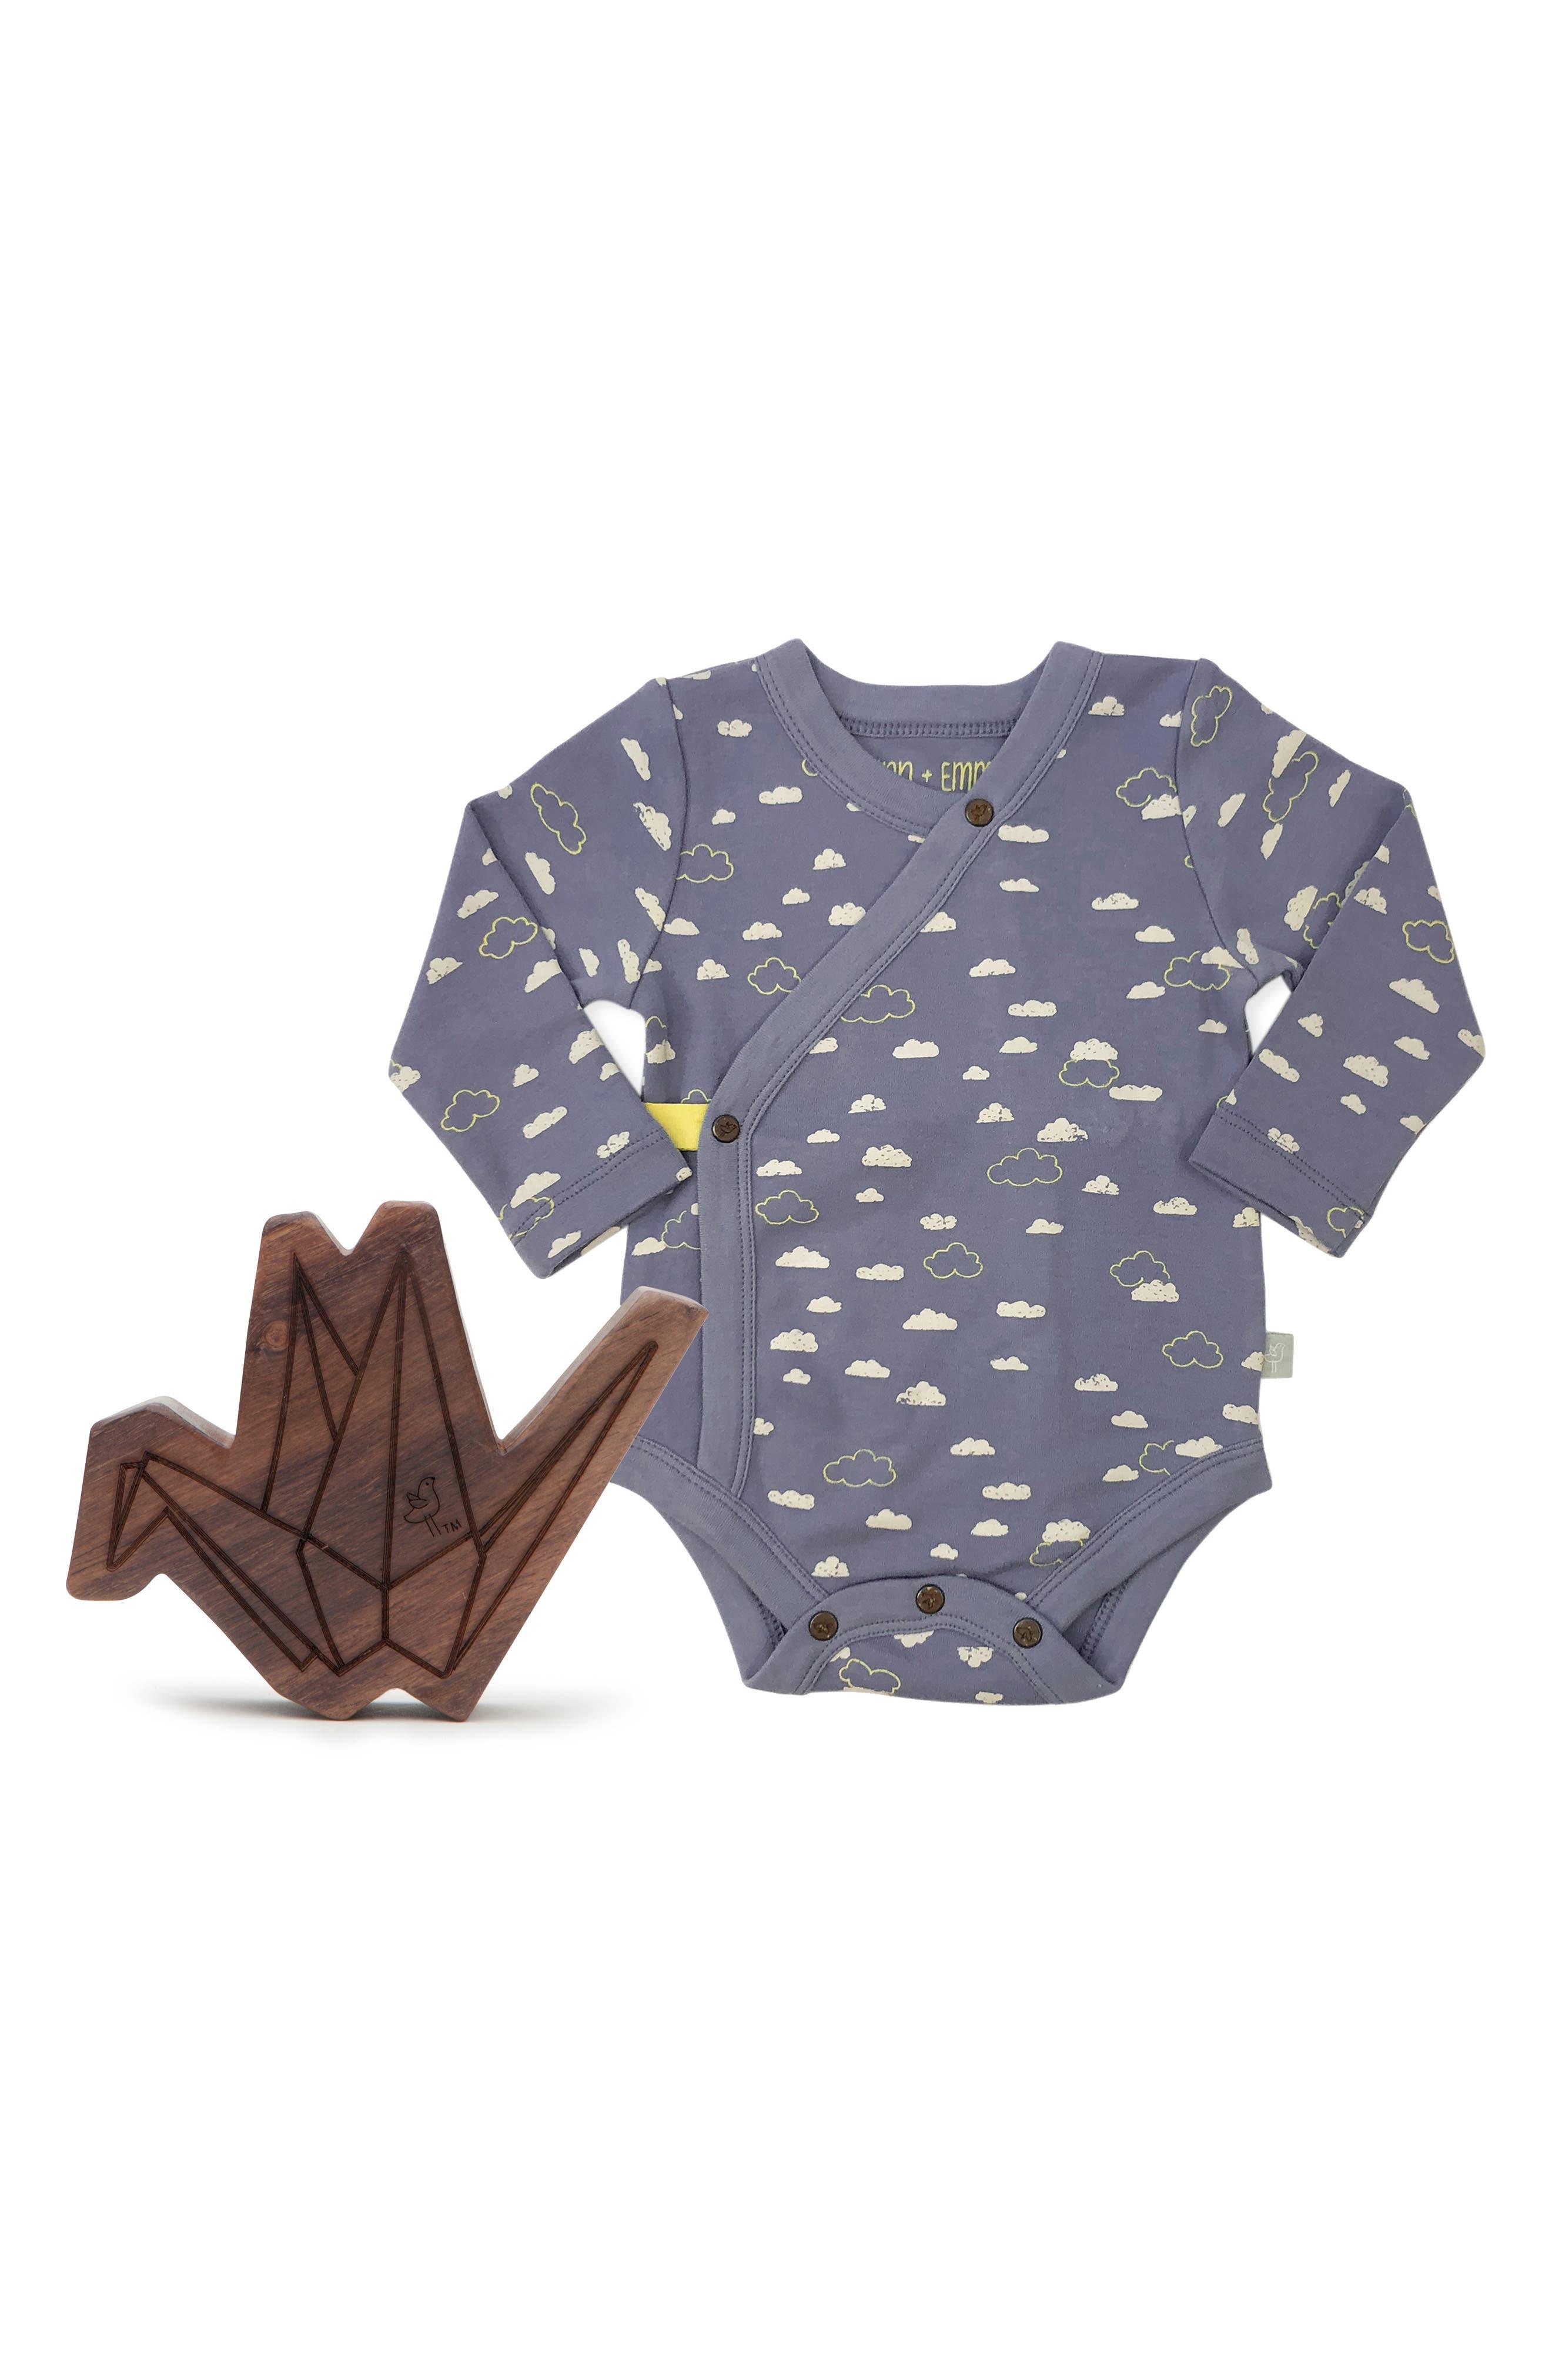 Clouds Organic Cotton Wrap Bodysuit & Origami Wood Teether Rattle Set,                         Main,                         color, BLUE